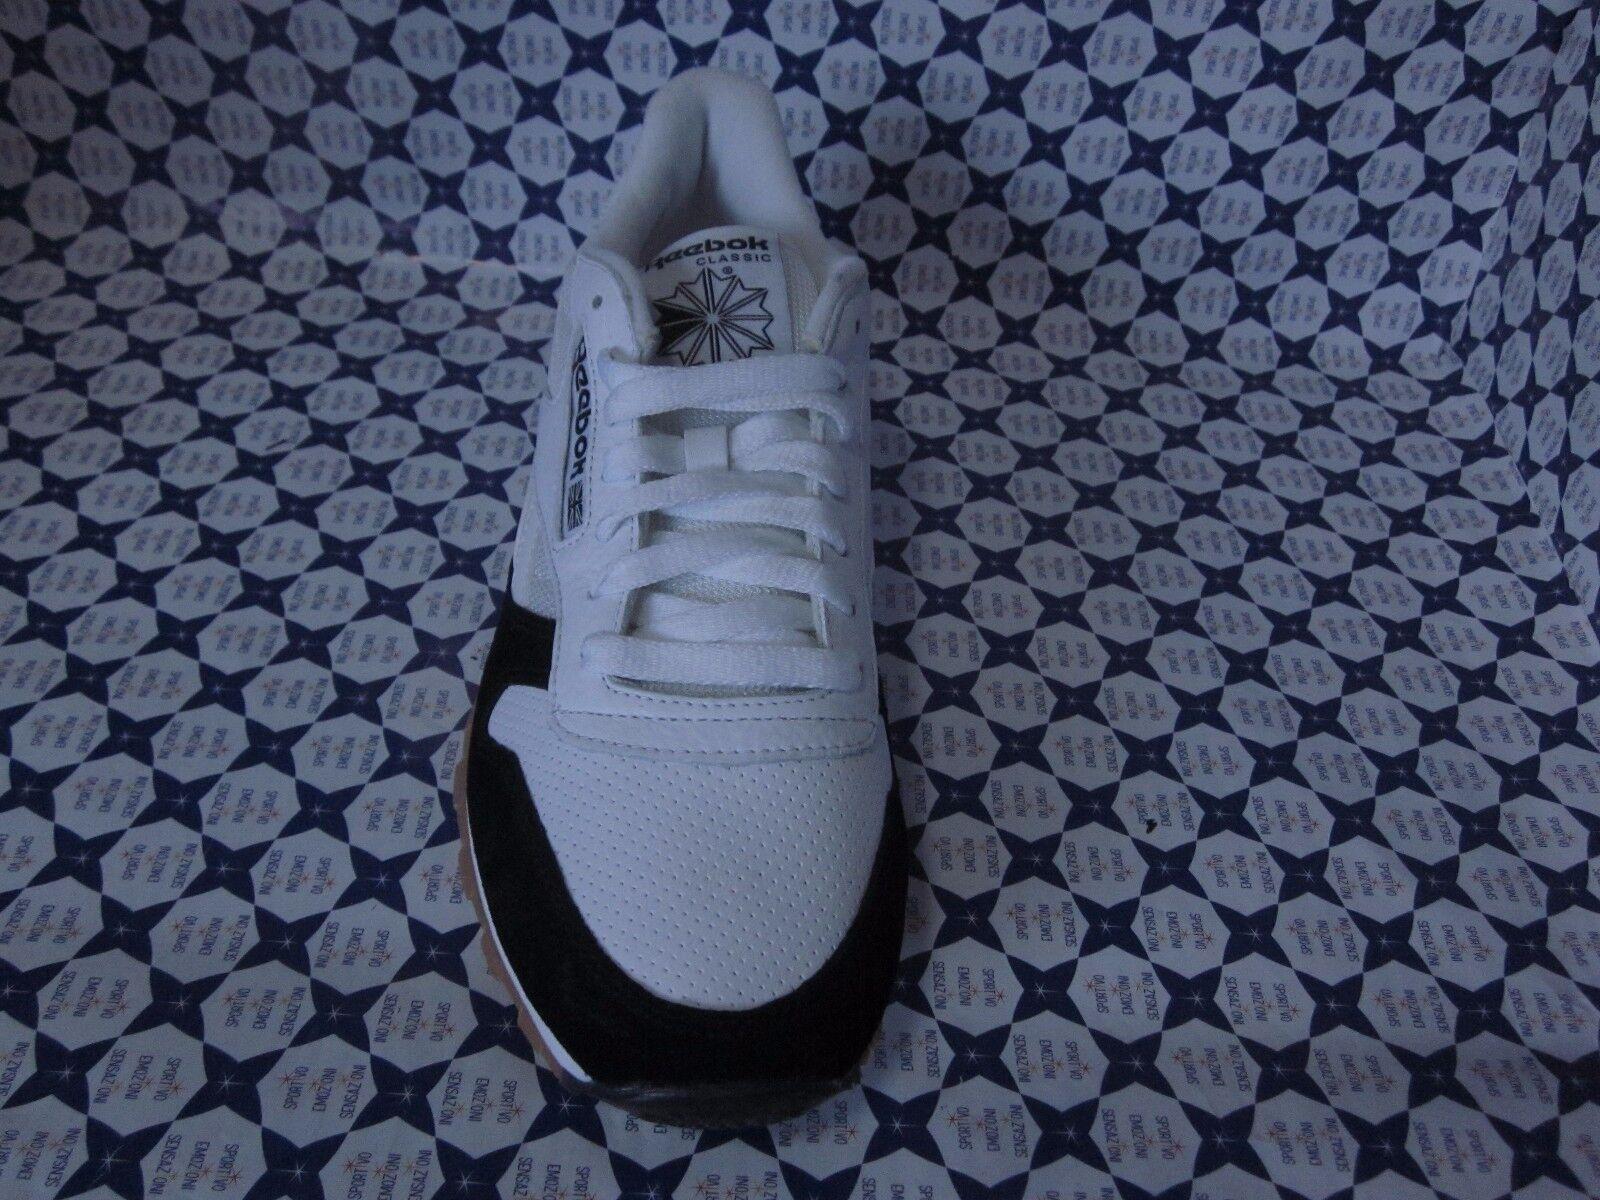 Scarpe Reebok CL Leather SPP Ginnastica Casual Retrò  -- Bianco Nero -- AR1894